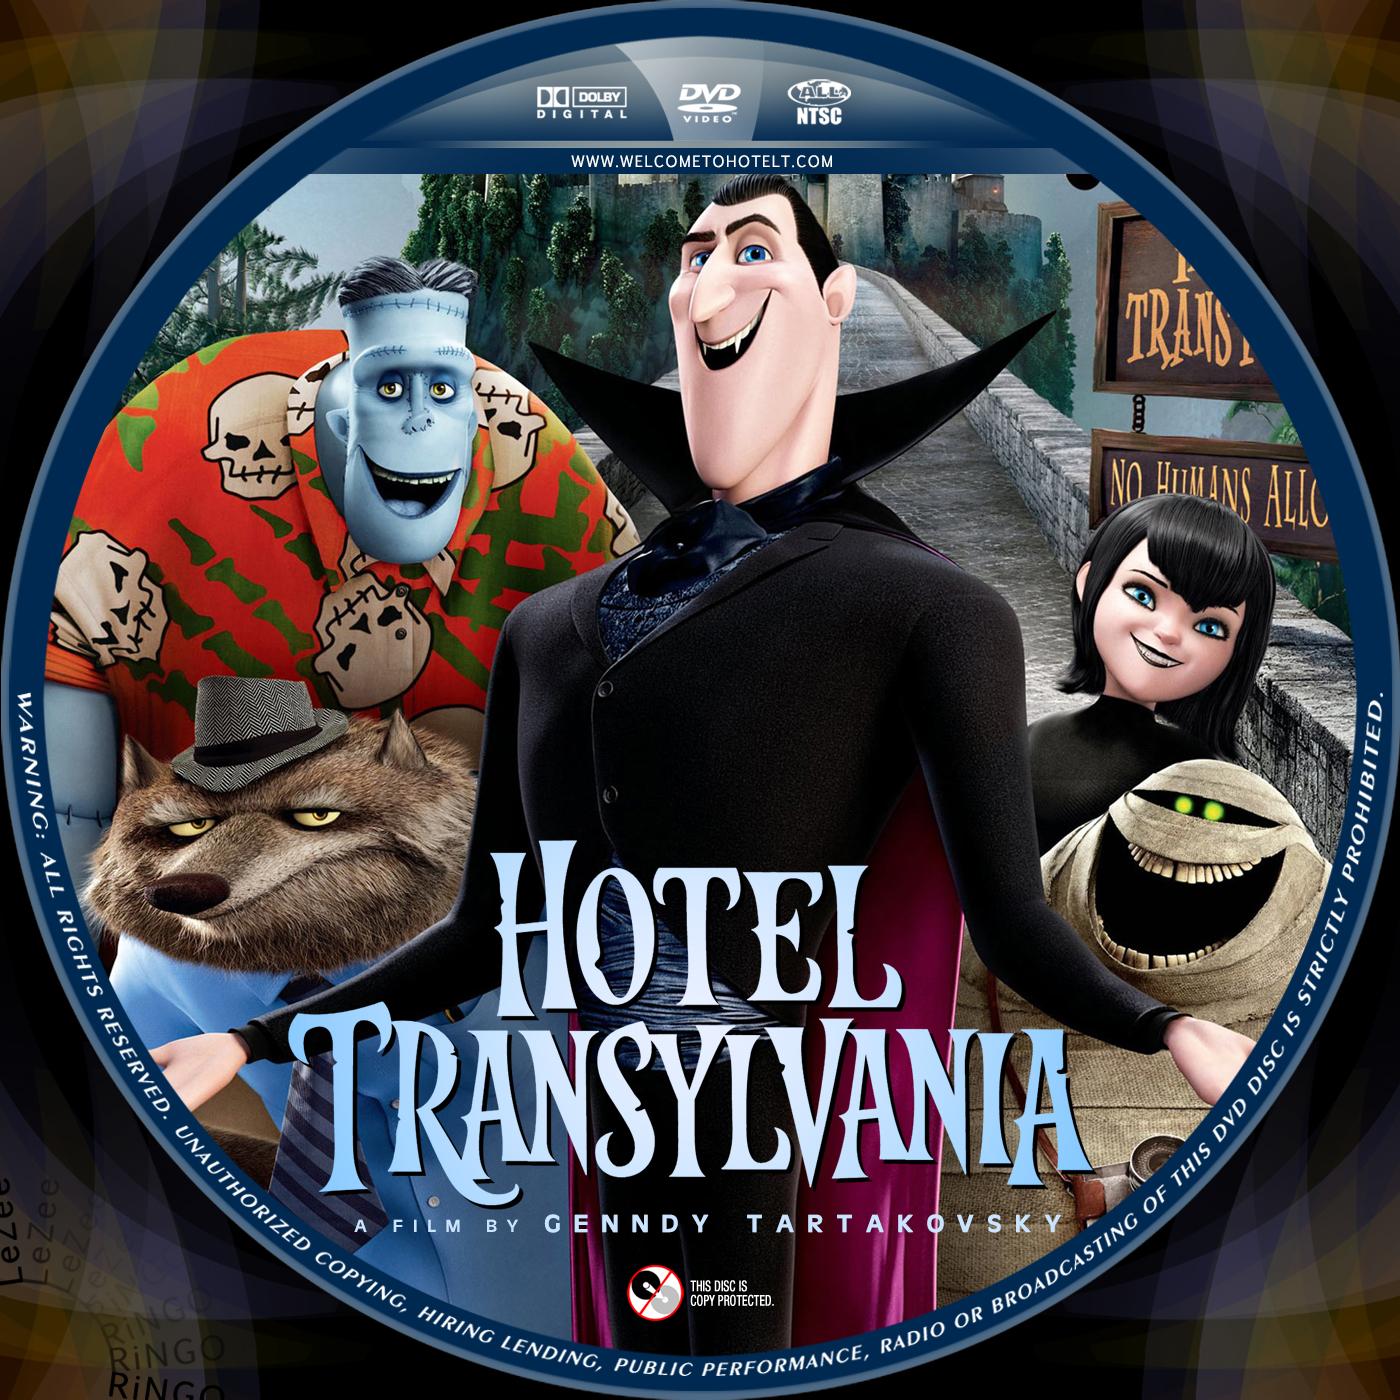 Covers box sk hotel transylvania 2012 high quality dvd